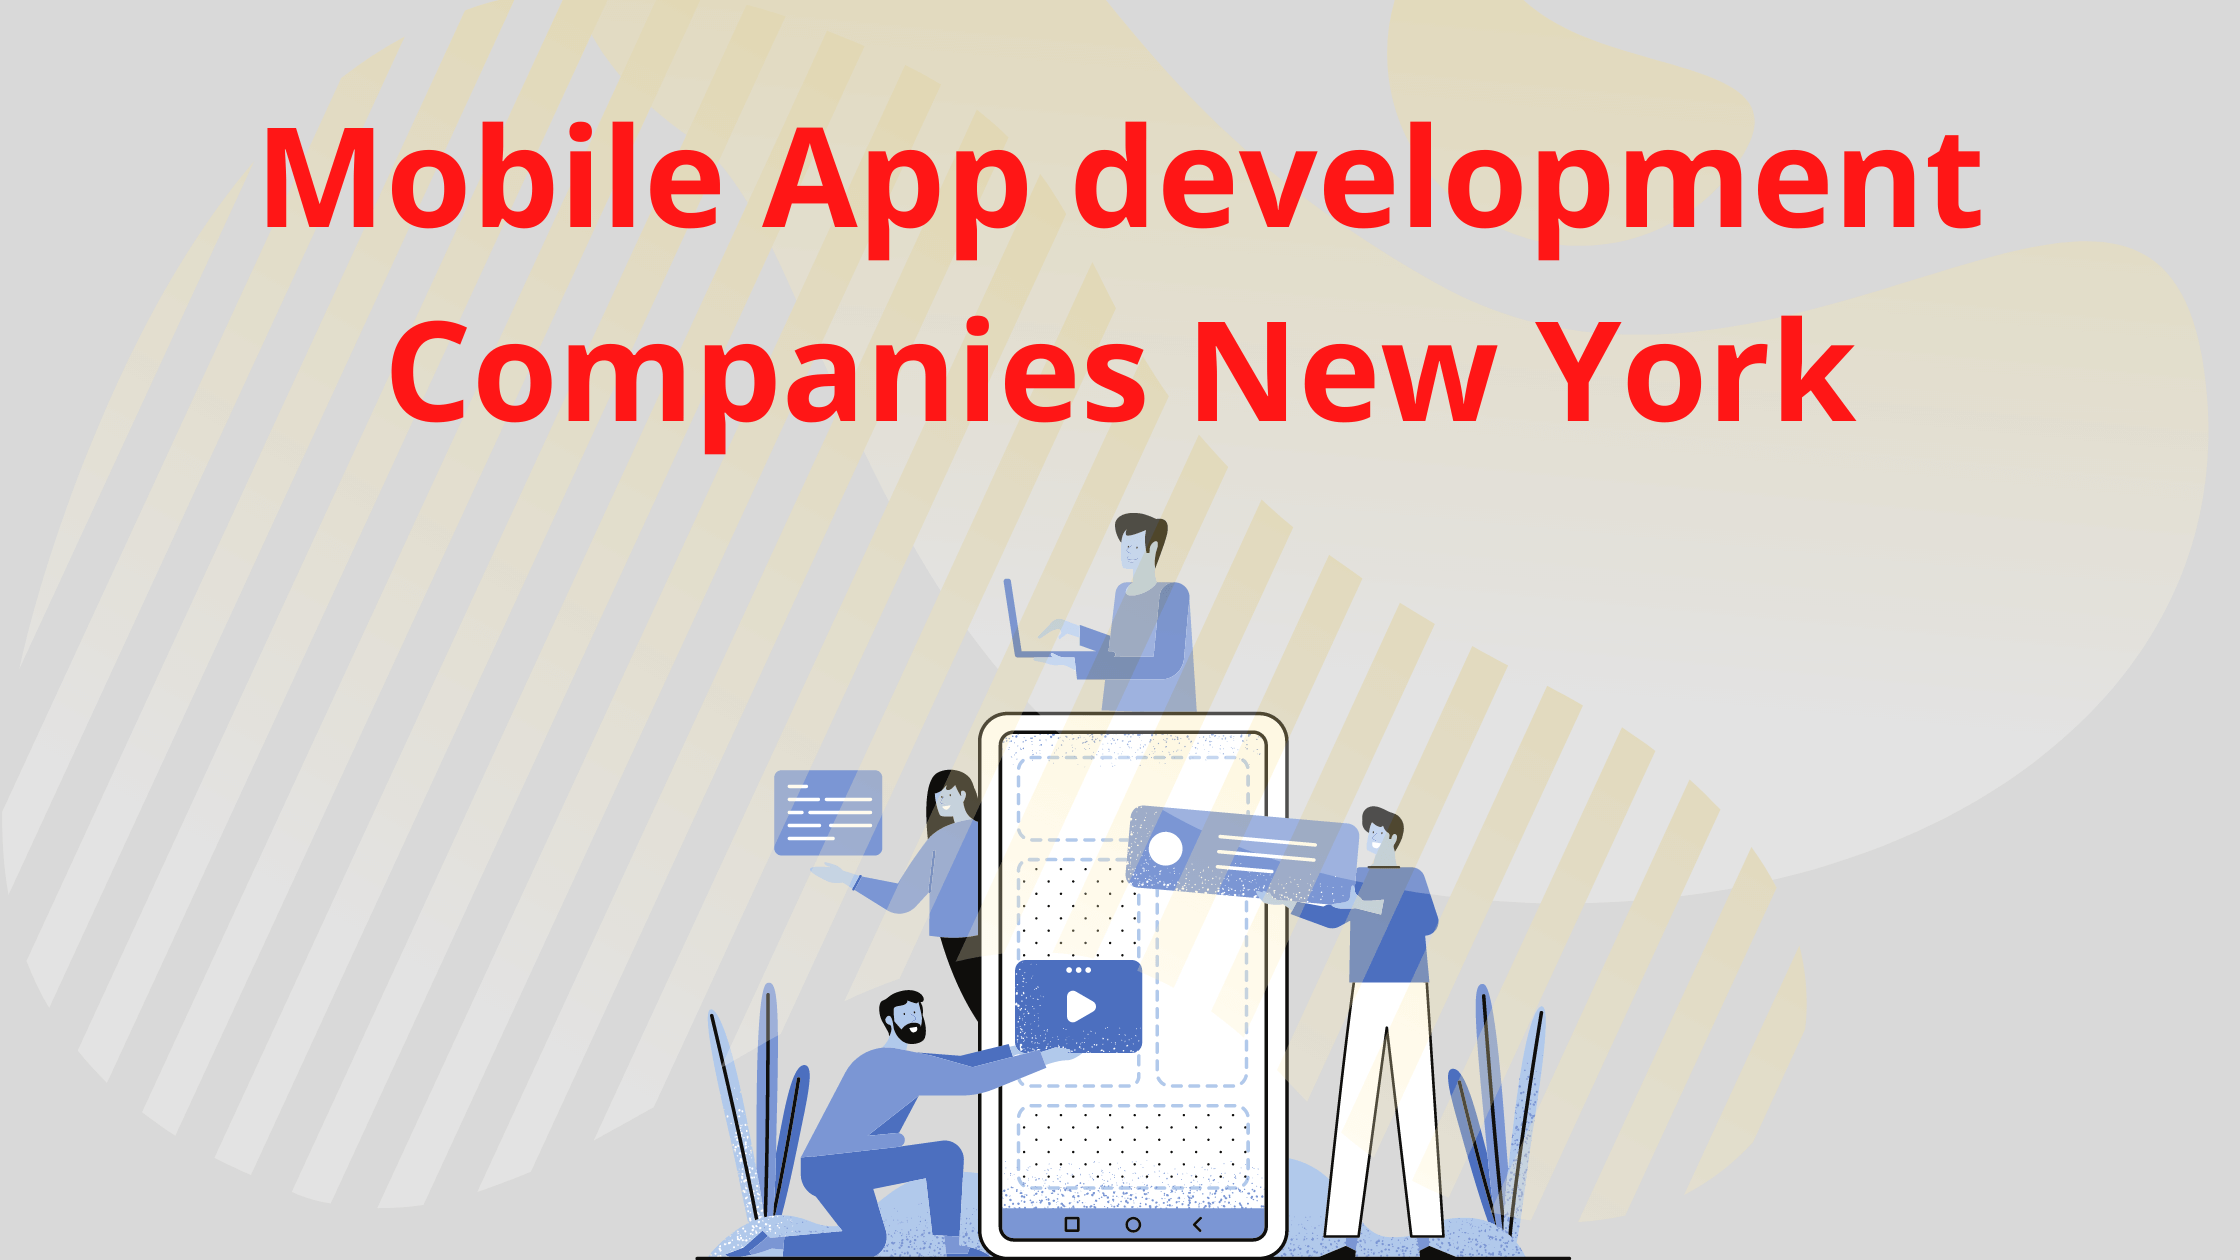 Mobile App development Companies in New York